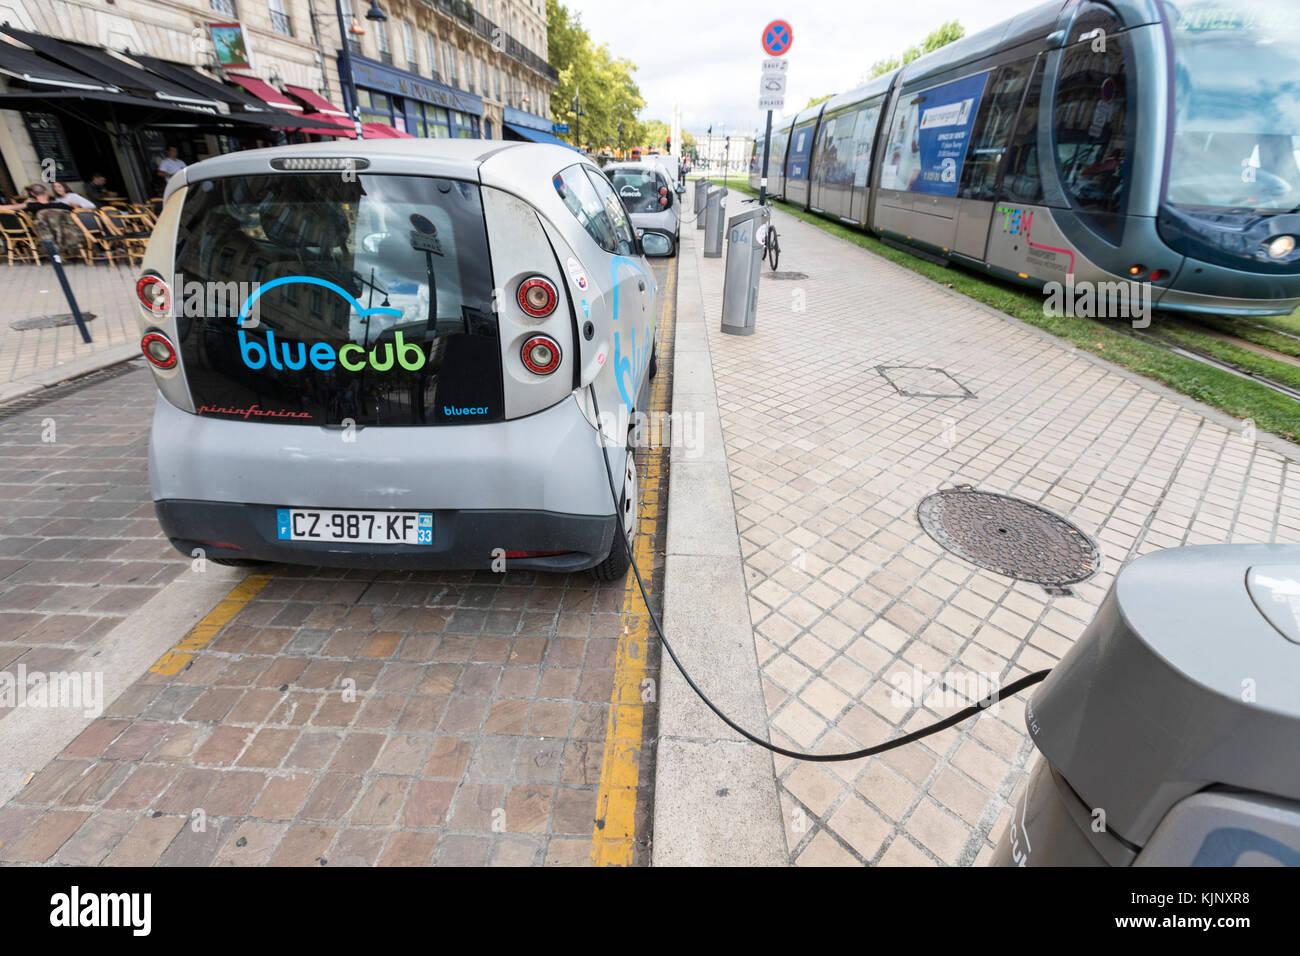 Bluecub electric car, Bolloré Bluecar a four-seat, three-door electric car by Bolloré, designed by Pininfarina, - Stock Image